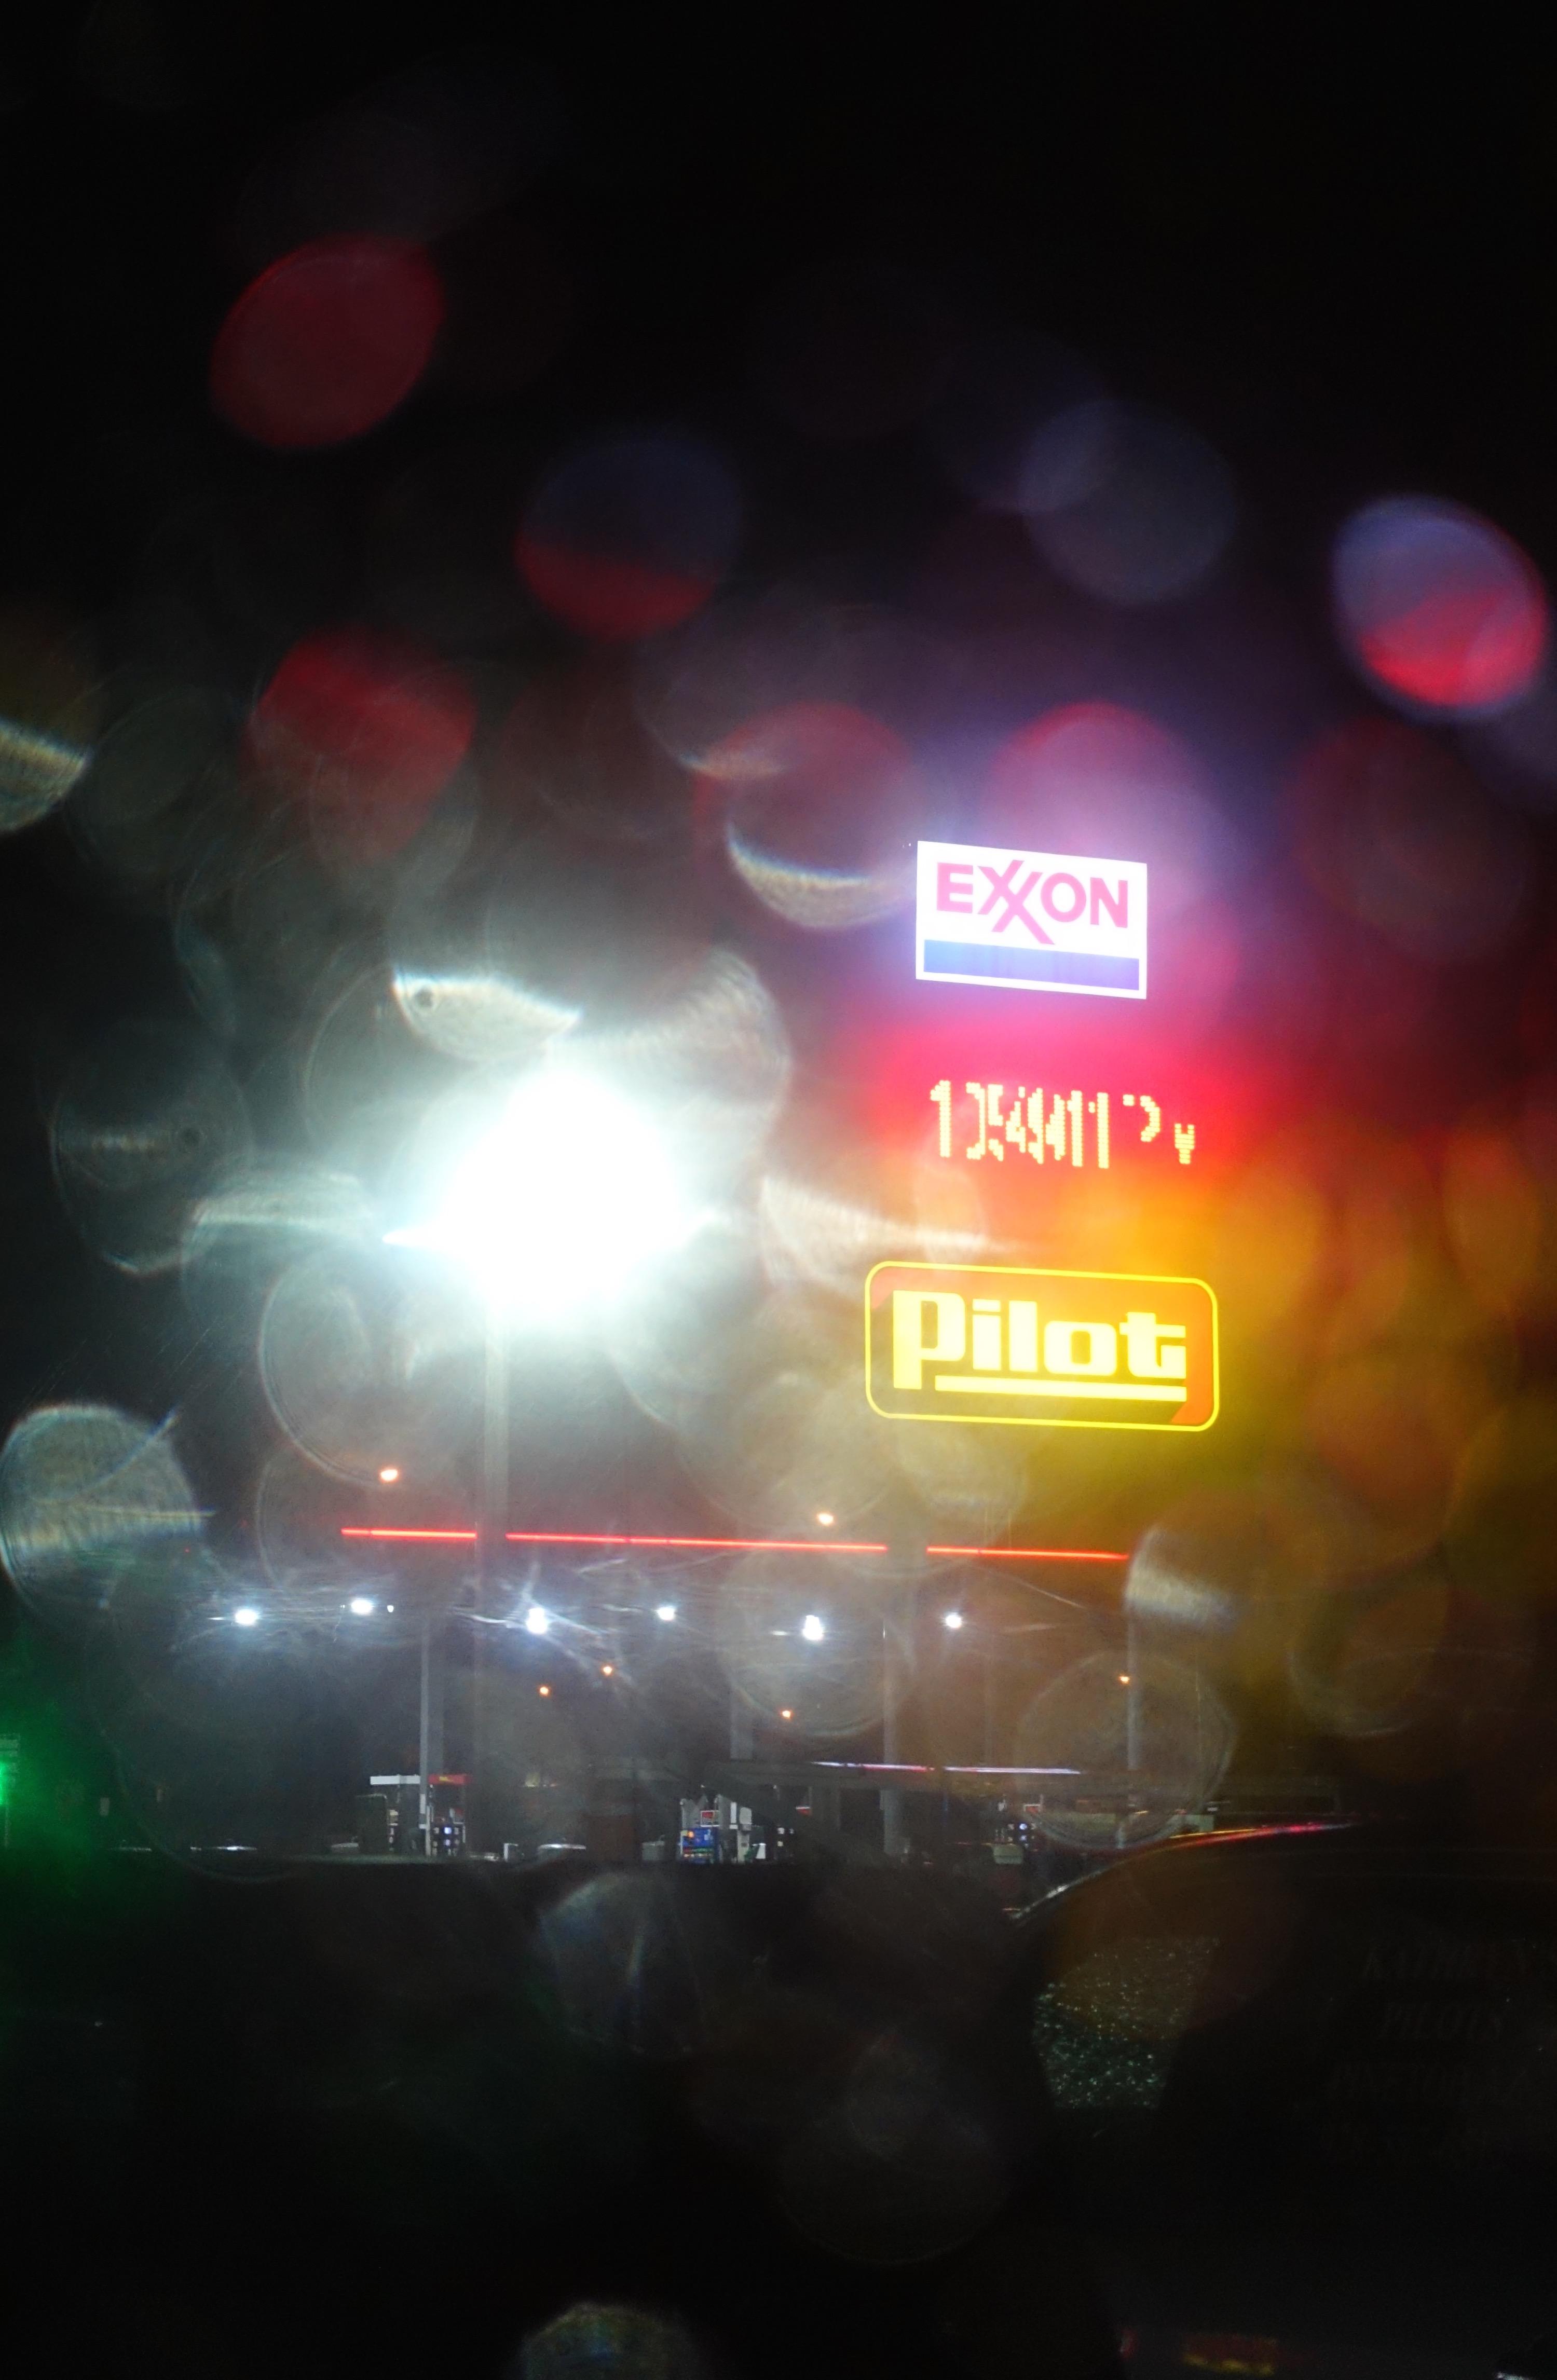 Montana big horn county wyola - Rain Montana Pilot Exxon